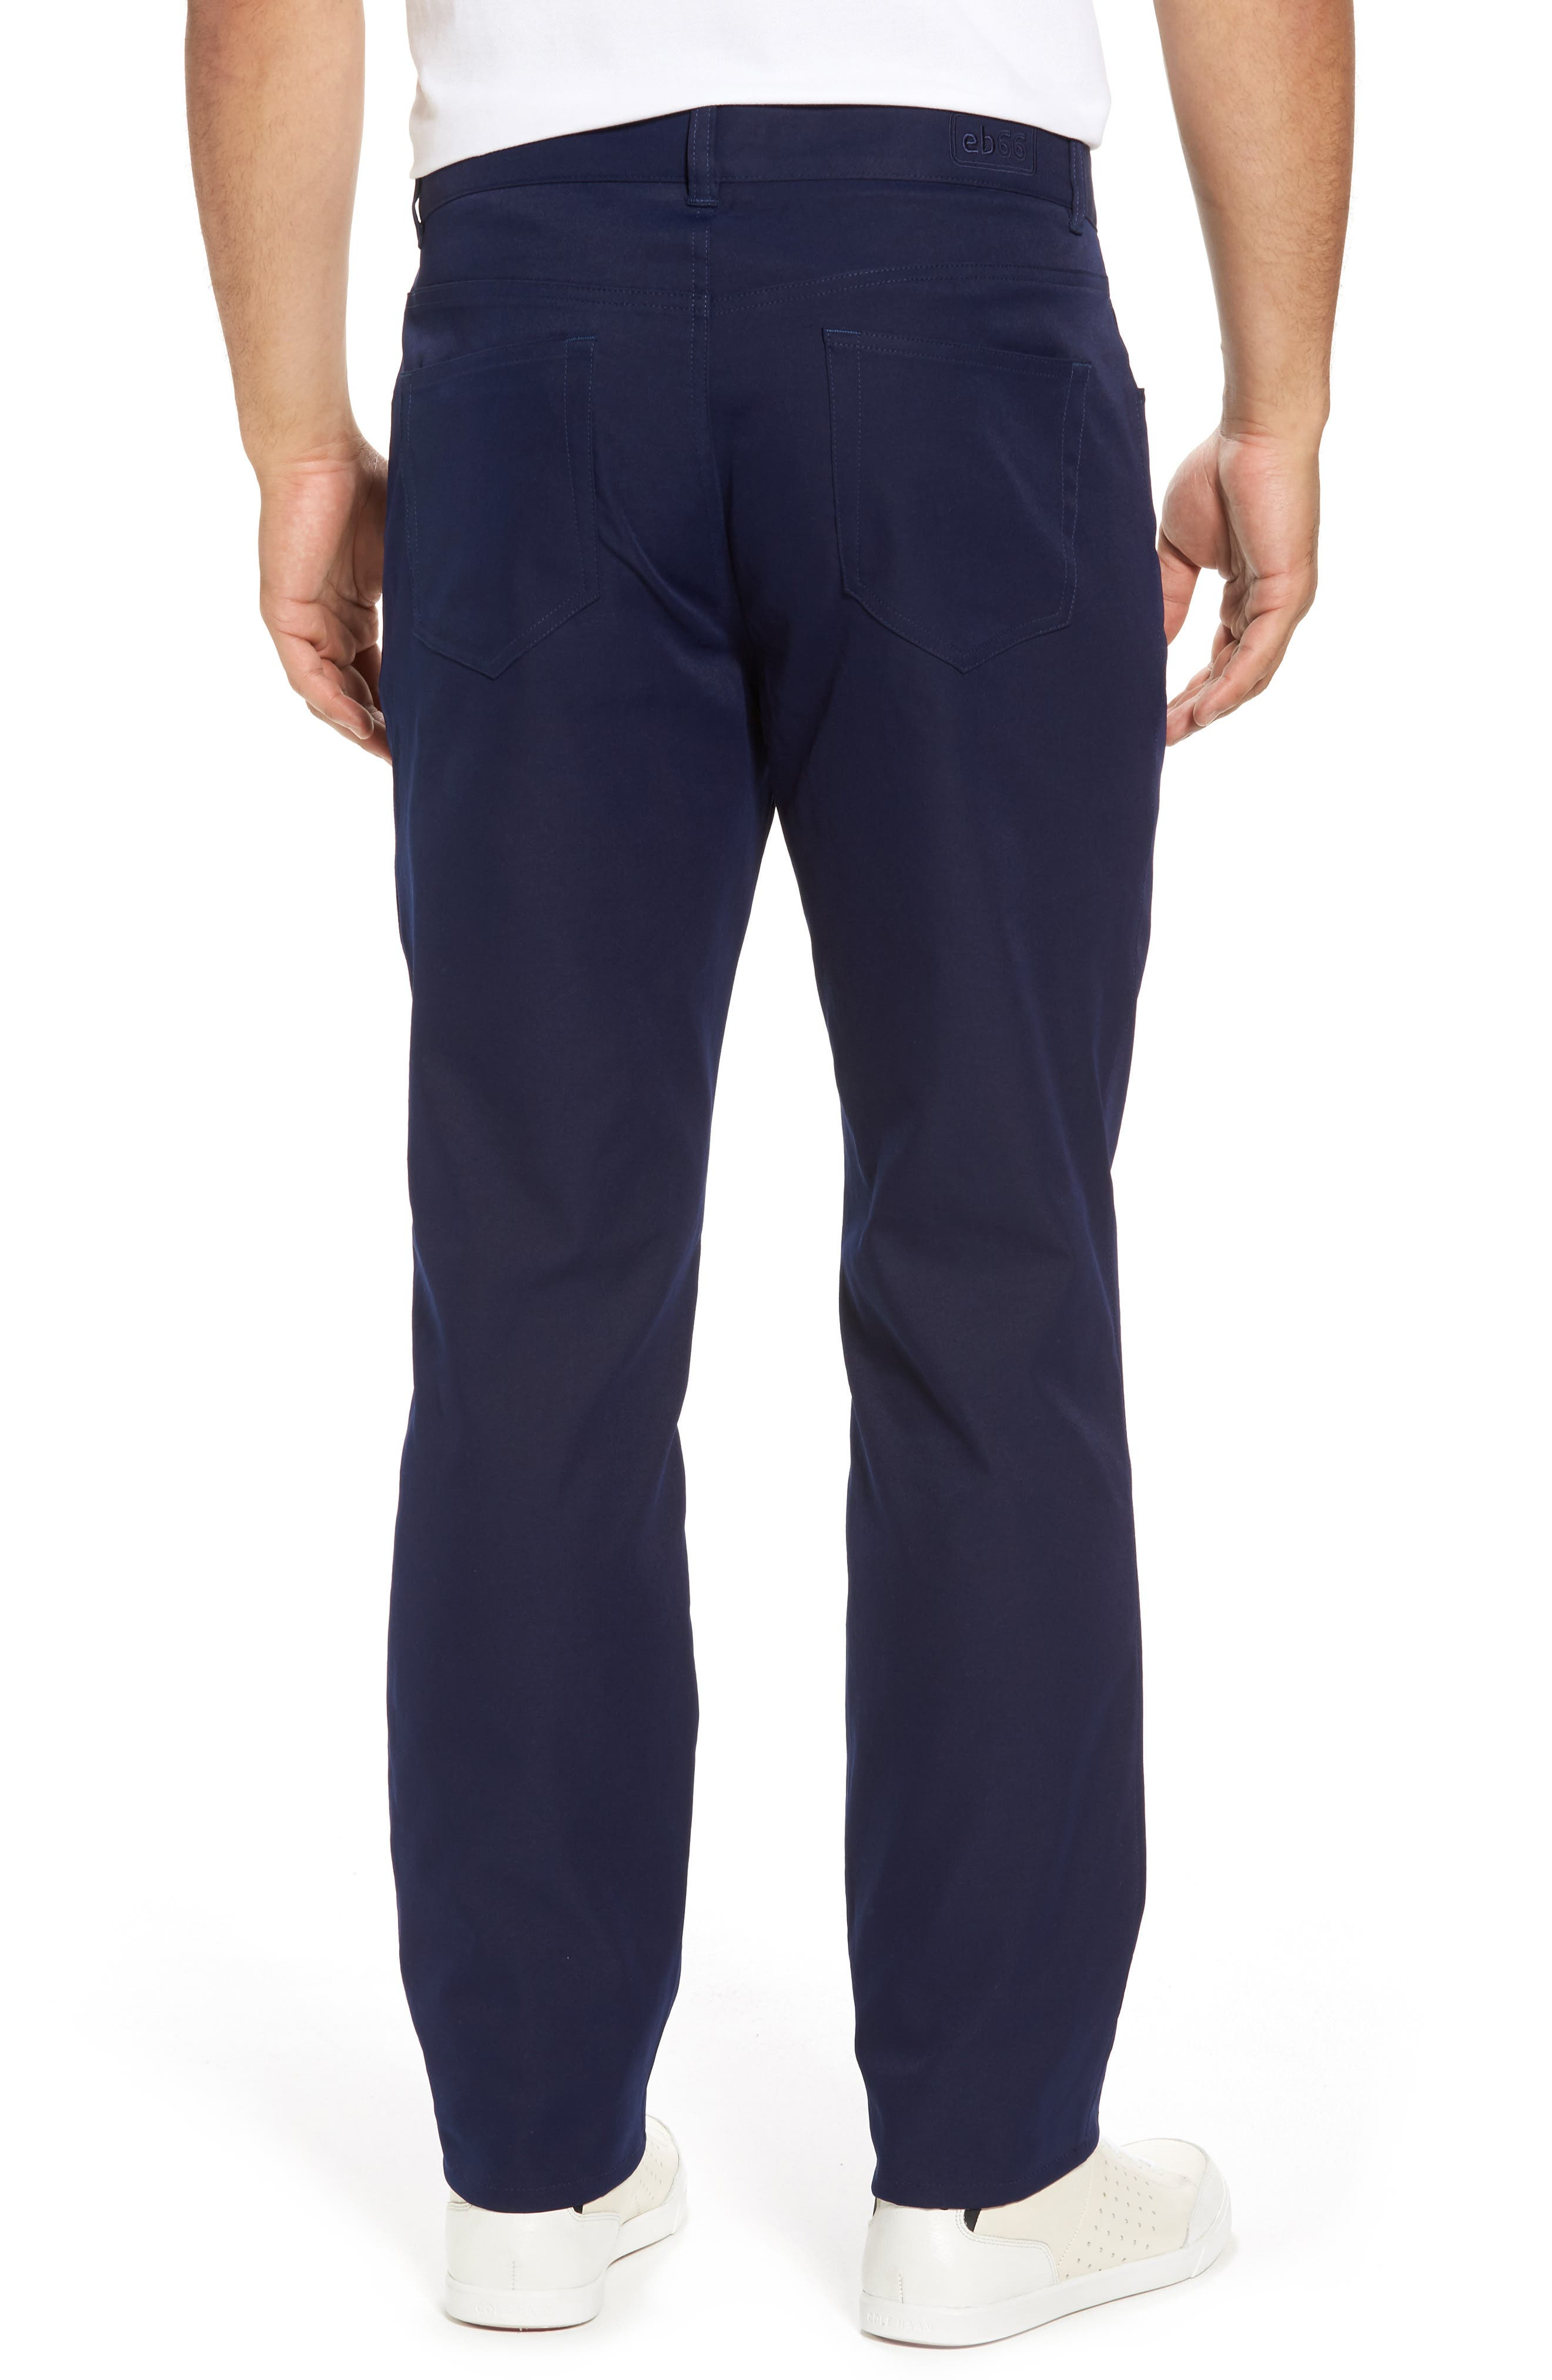 EB66 Performance Six-Pocket Pants,                             Alternate thumbnail 12, color,